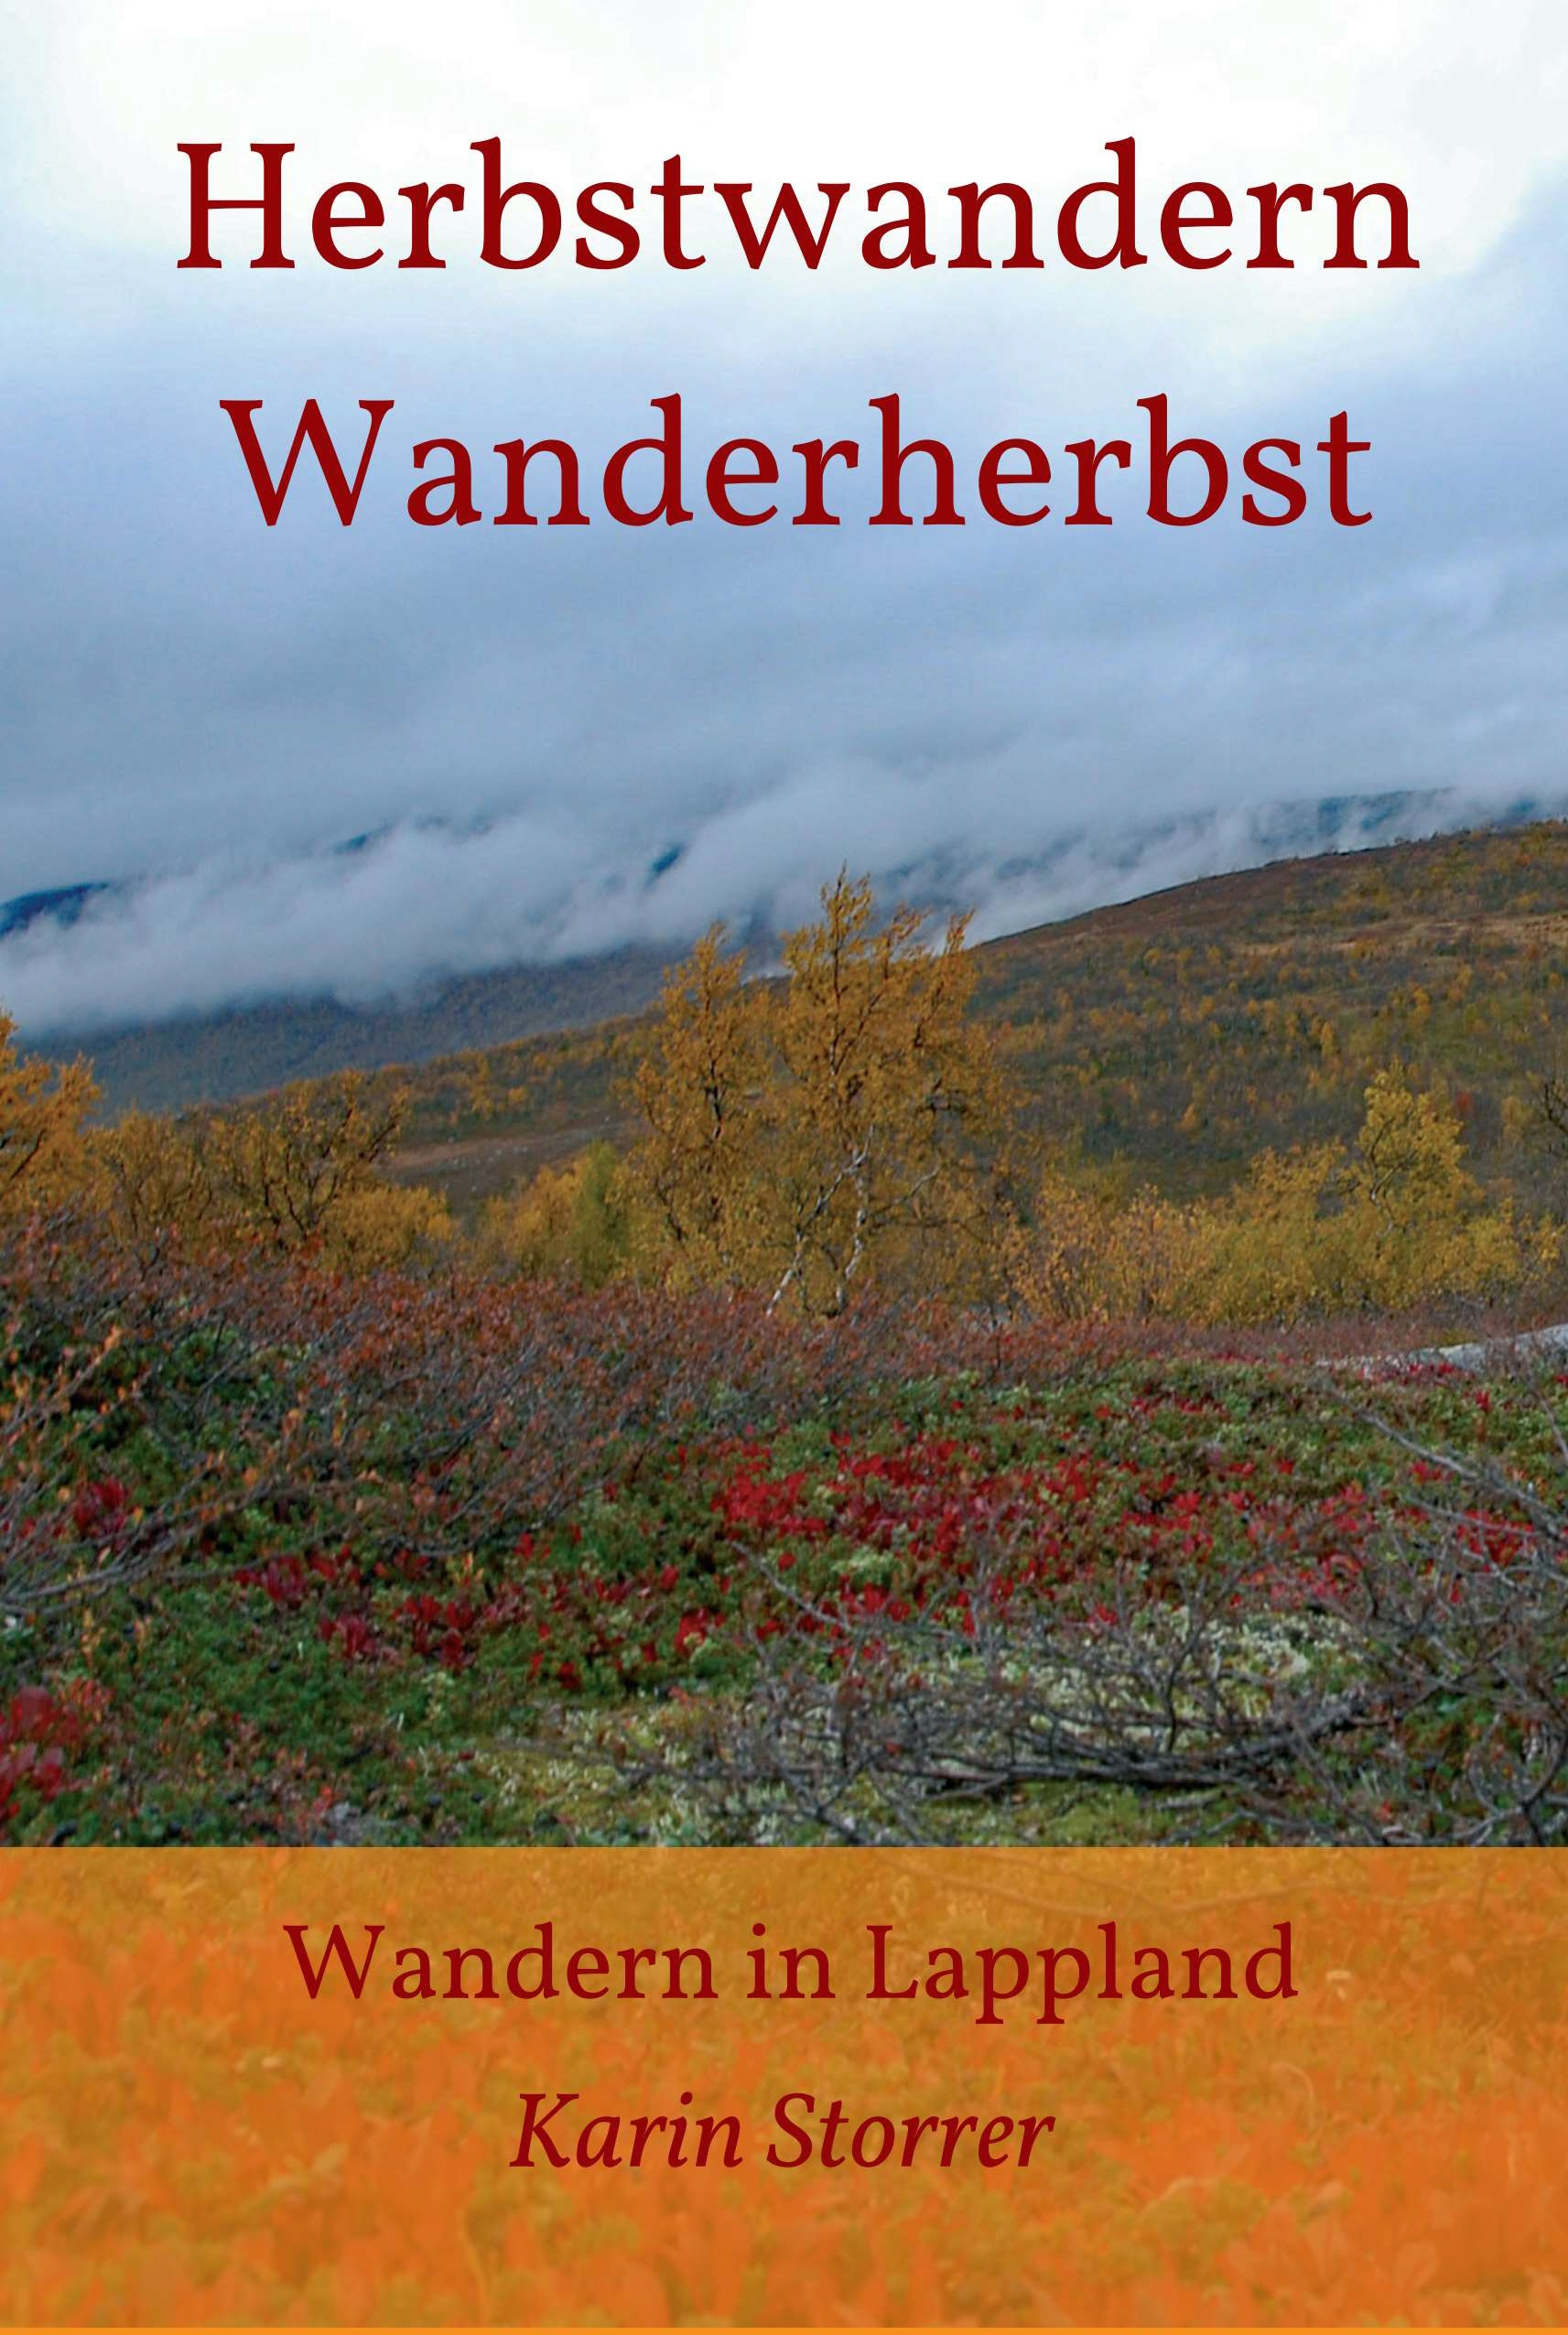 Herbstwandern - Wanderherbst